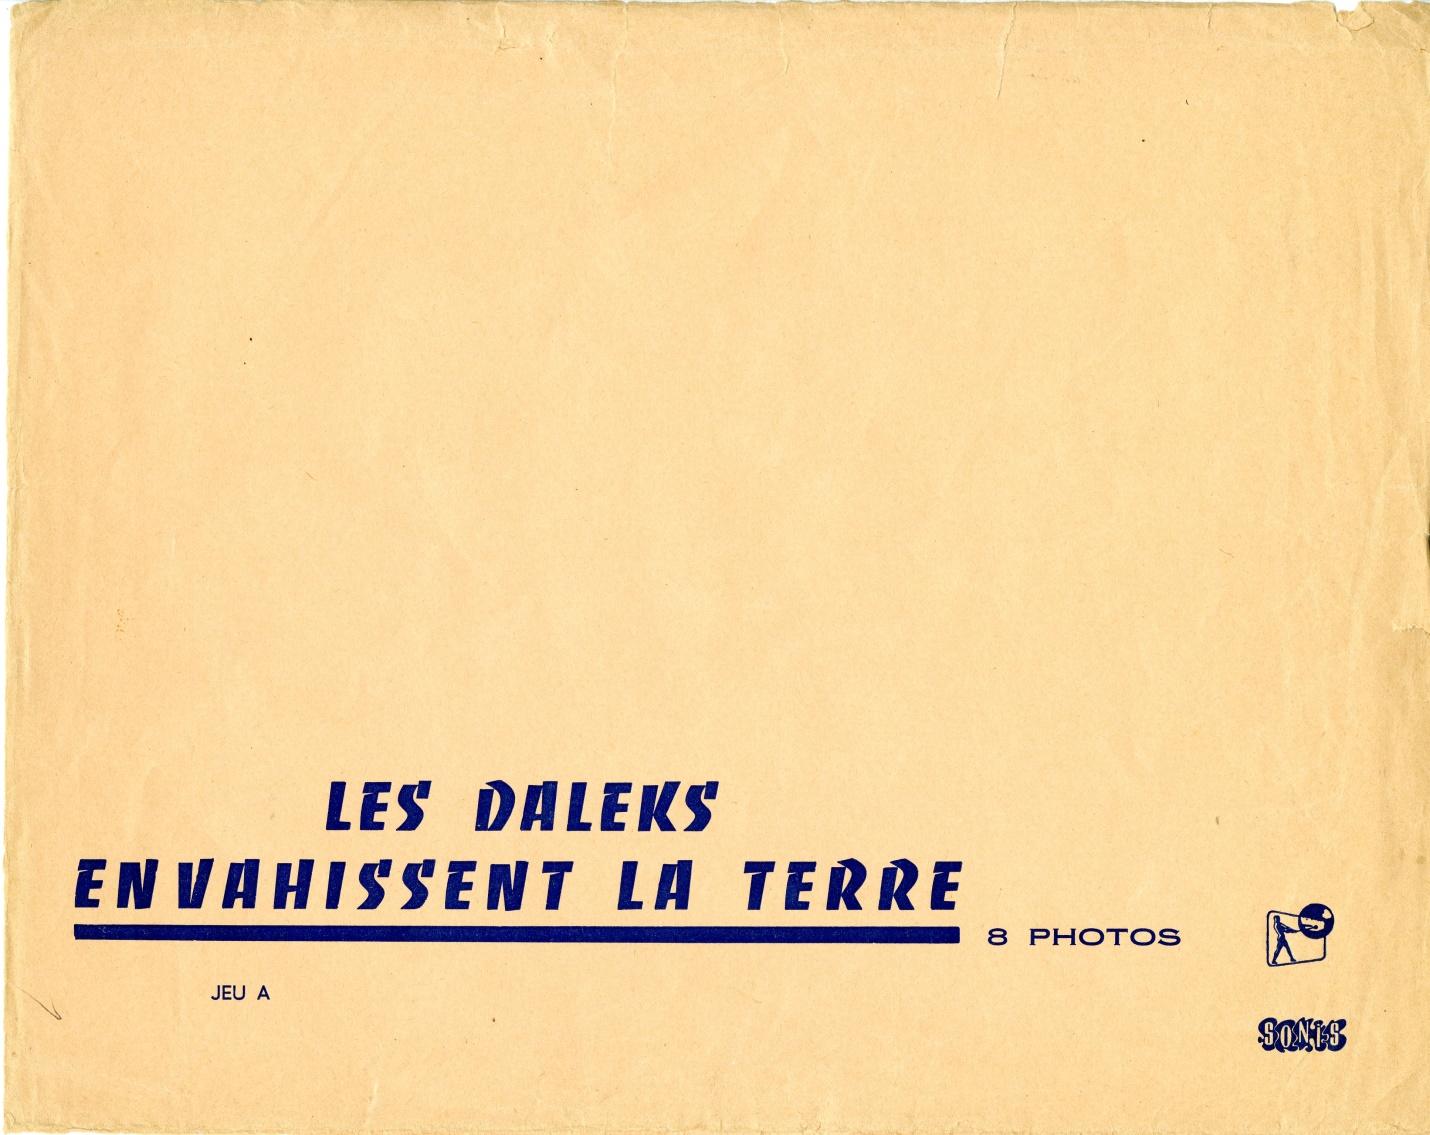 Envelope for set of French campaign stills